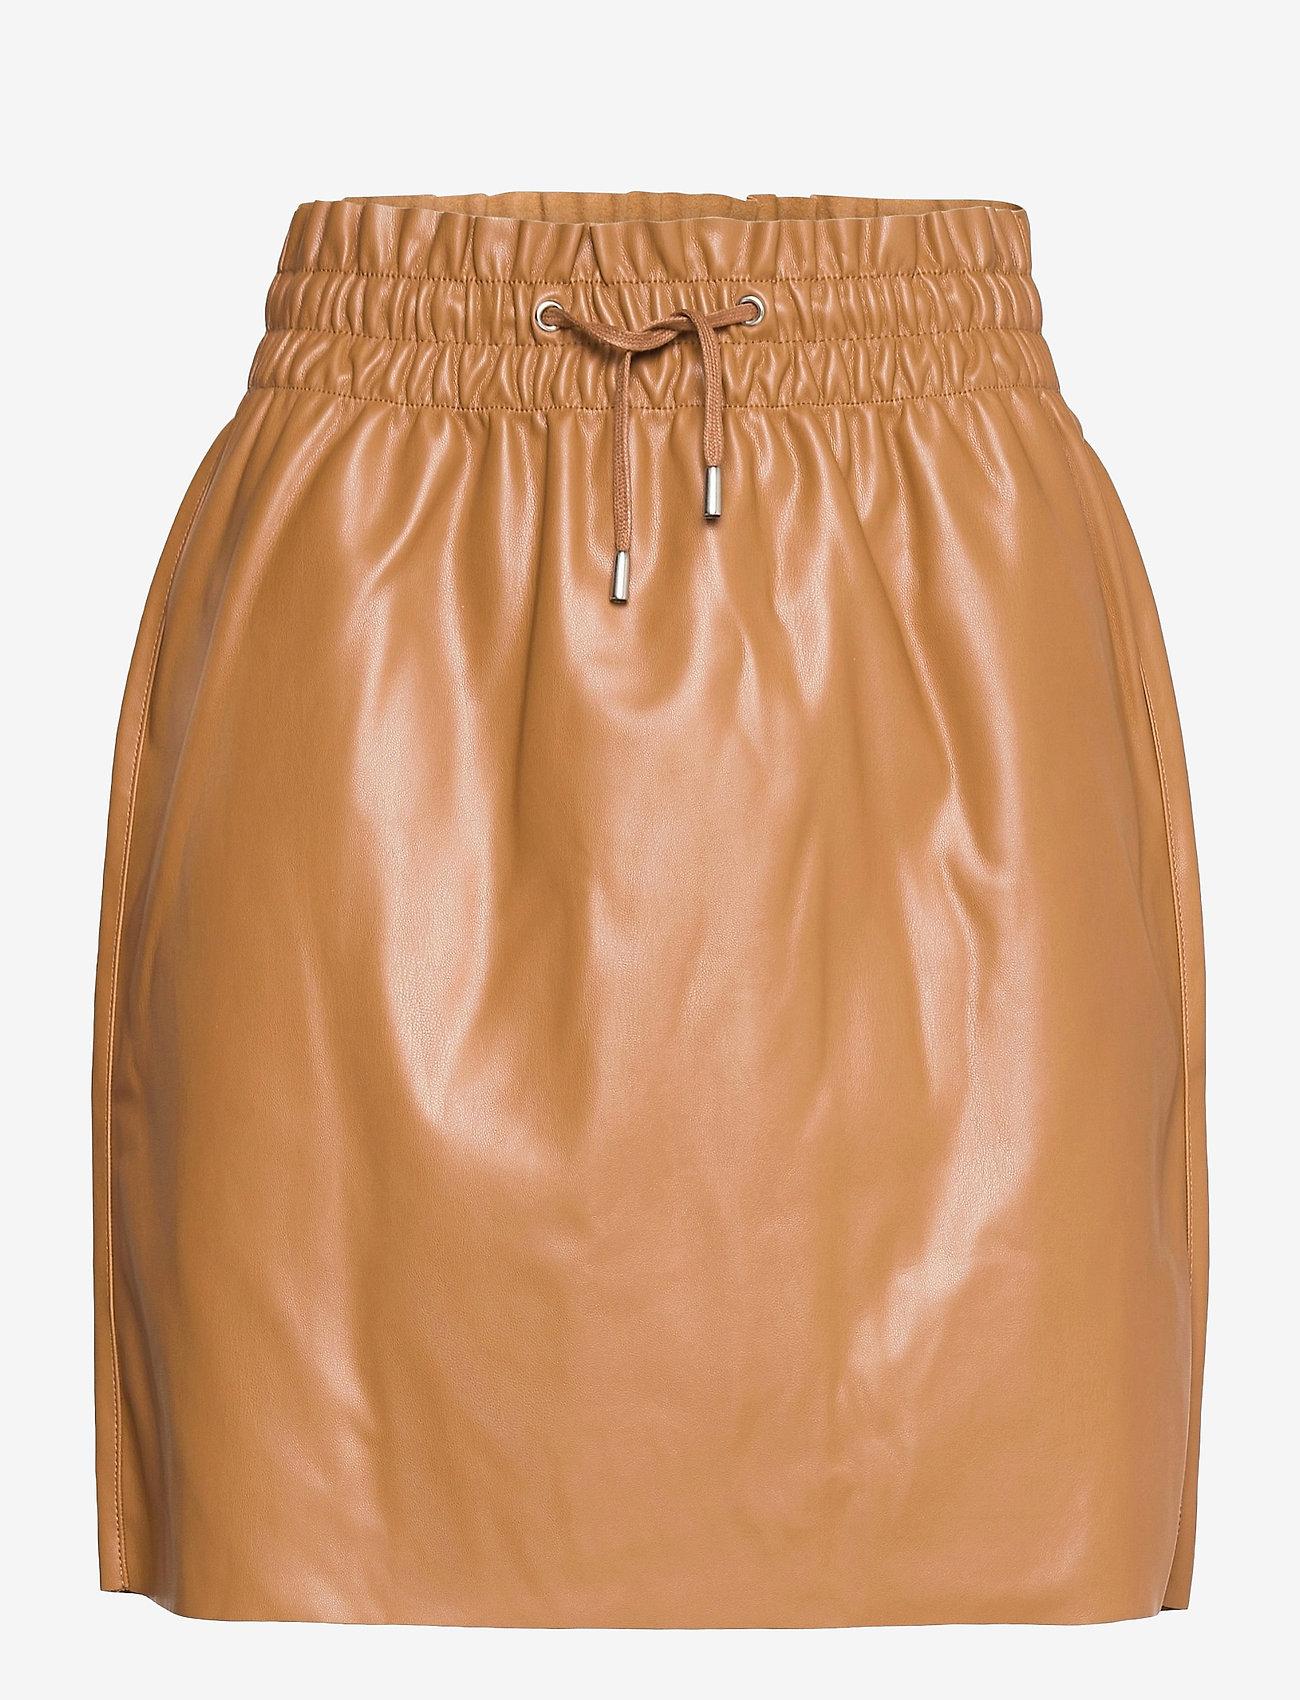 Vero Moda - VMAVA HW SHORT COATED SKIRT - korta kjolar - tobacco brown - 0